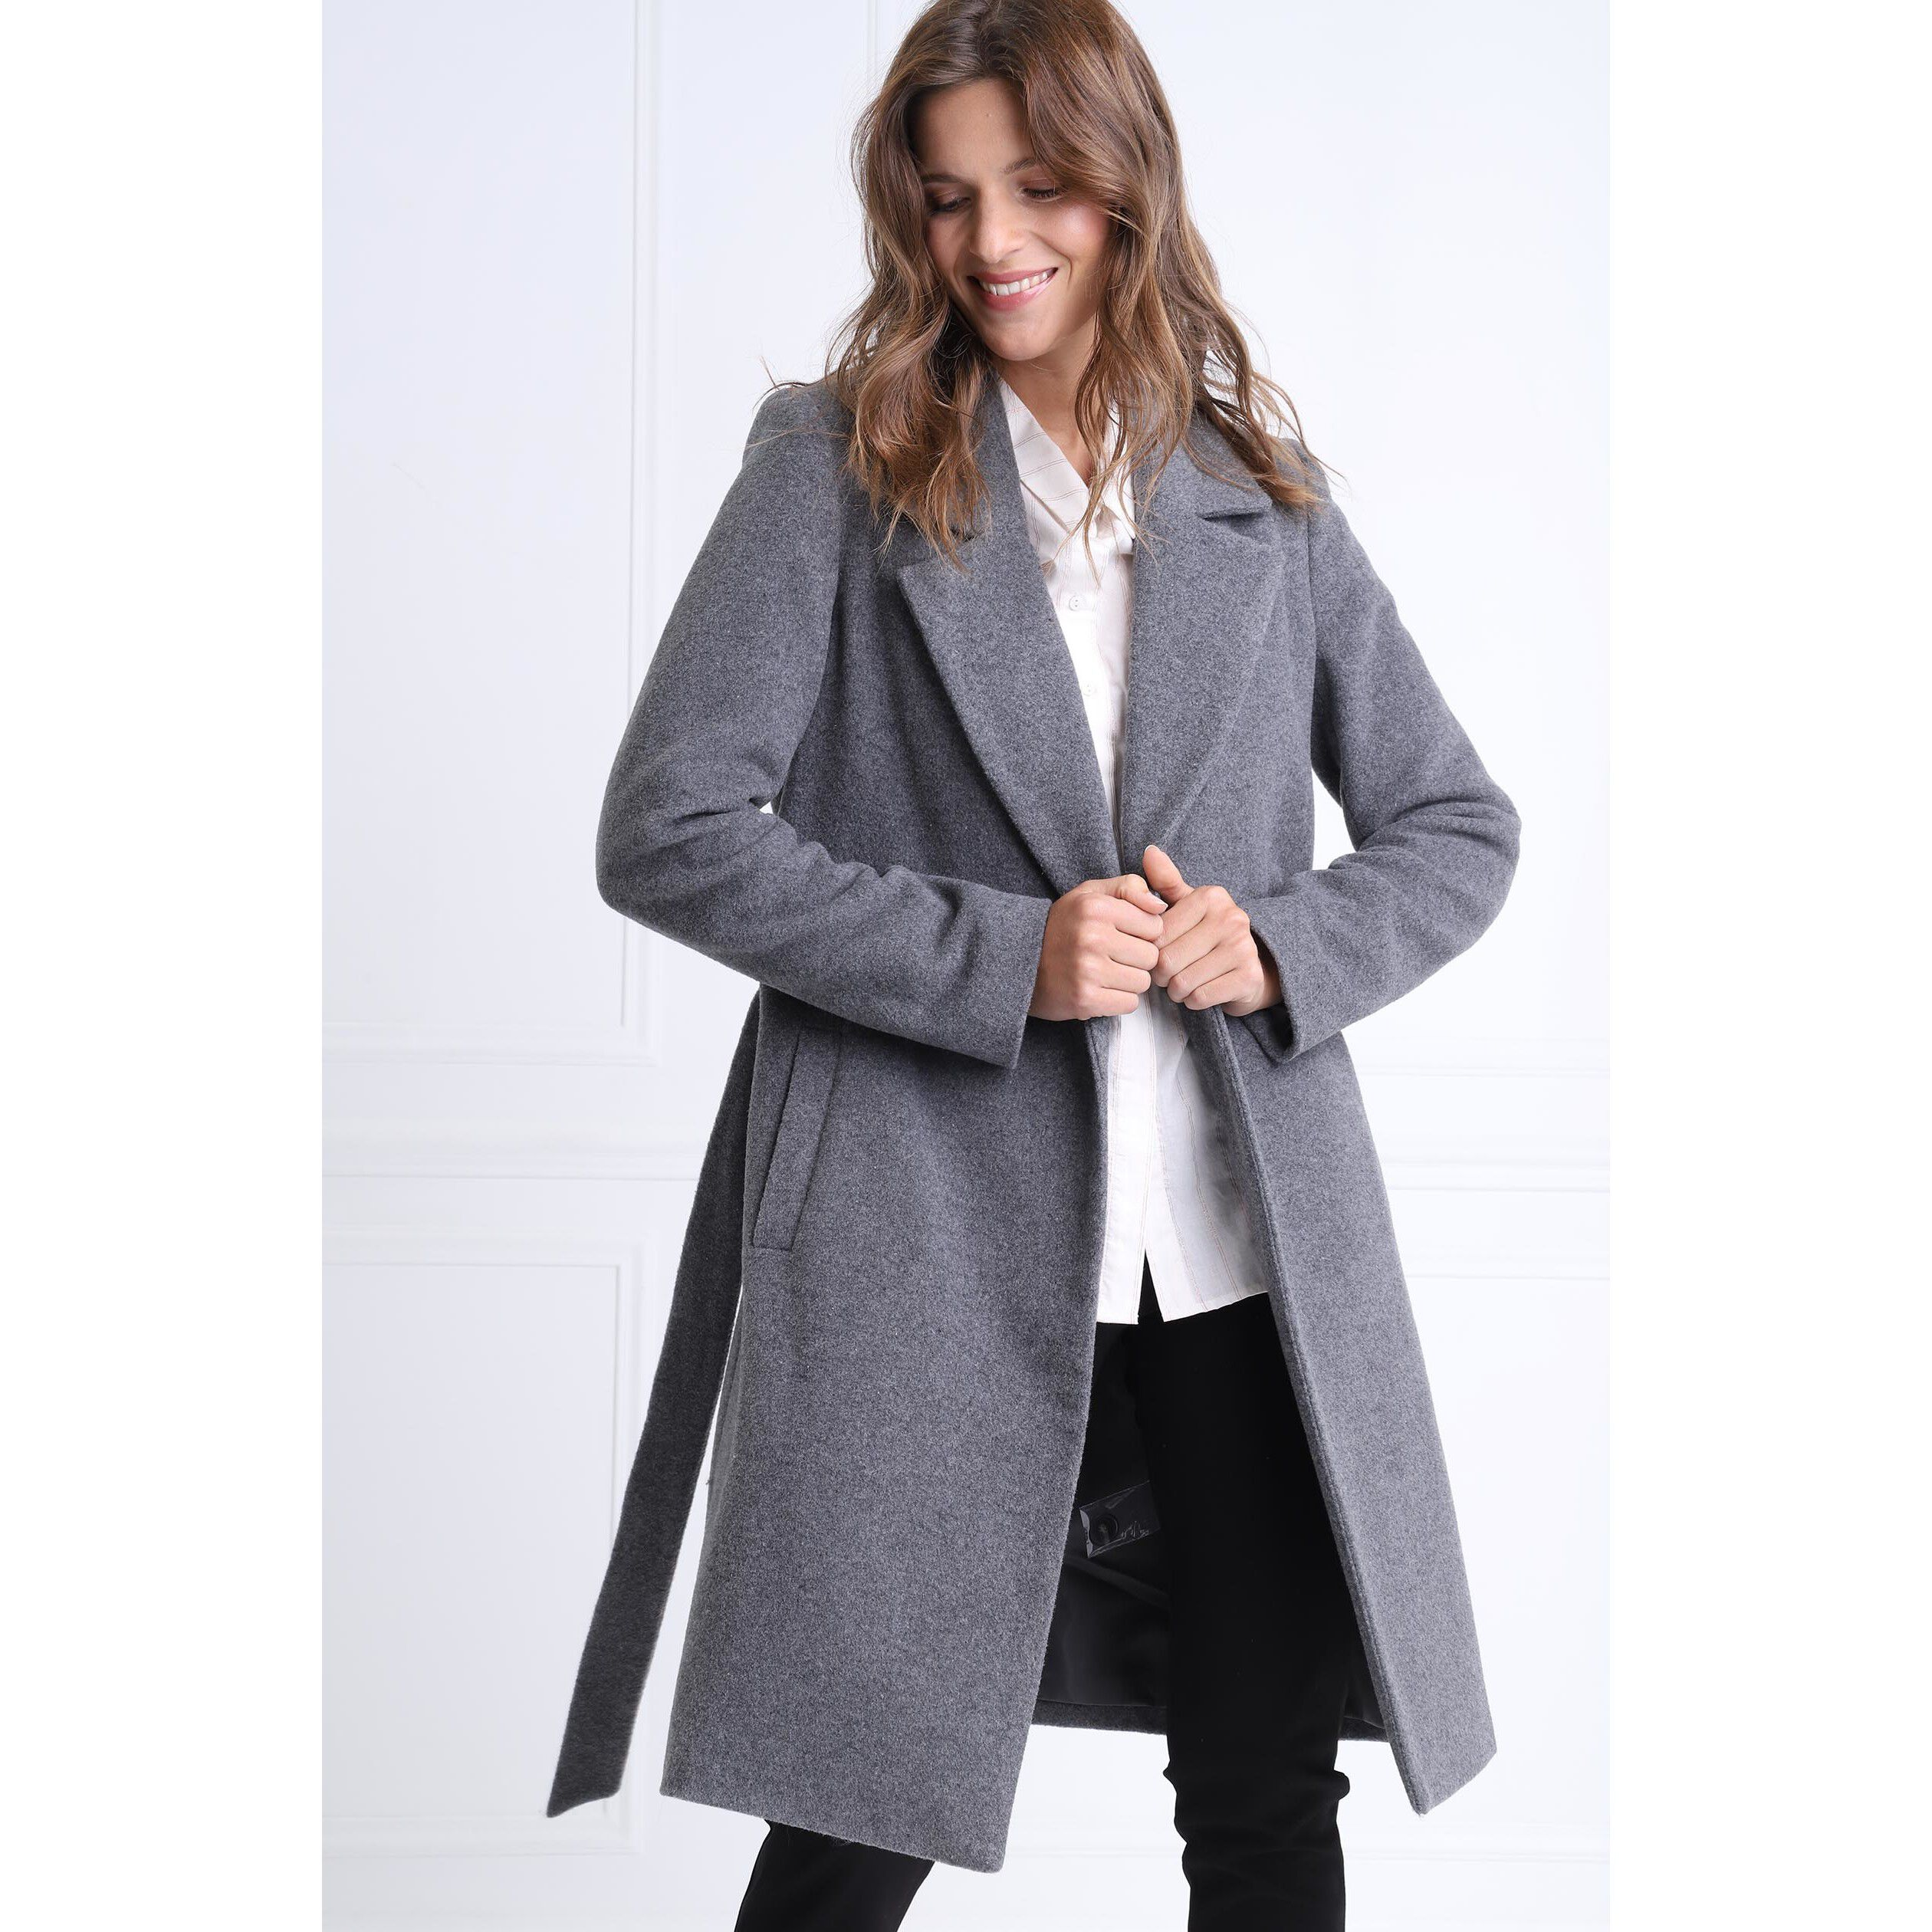 Manteau femmeBréal en en femmeBréal en Manteau solde solde Manteau ul3TKJc1F